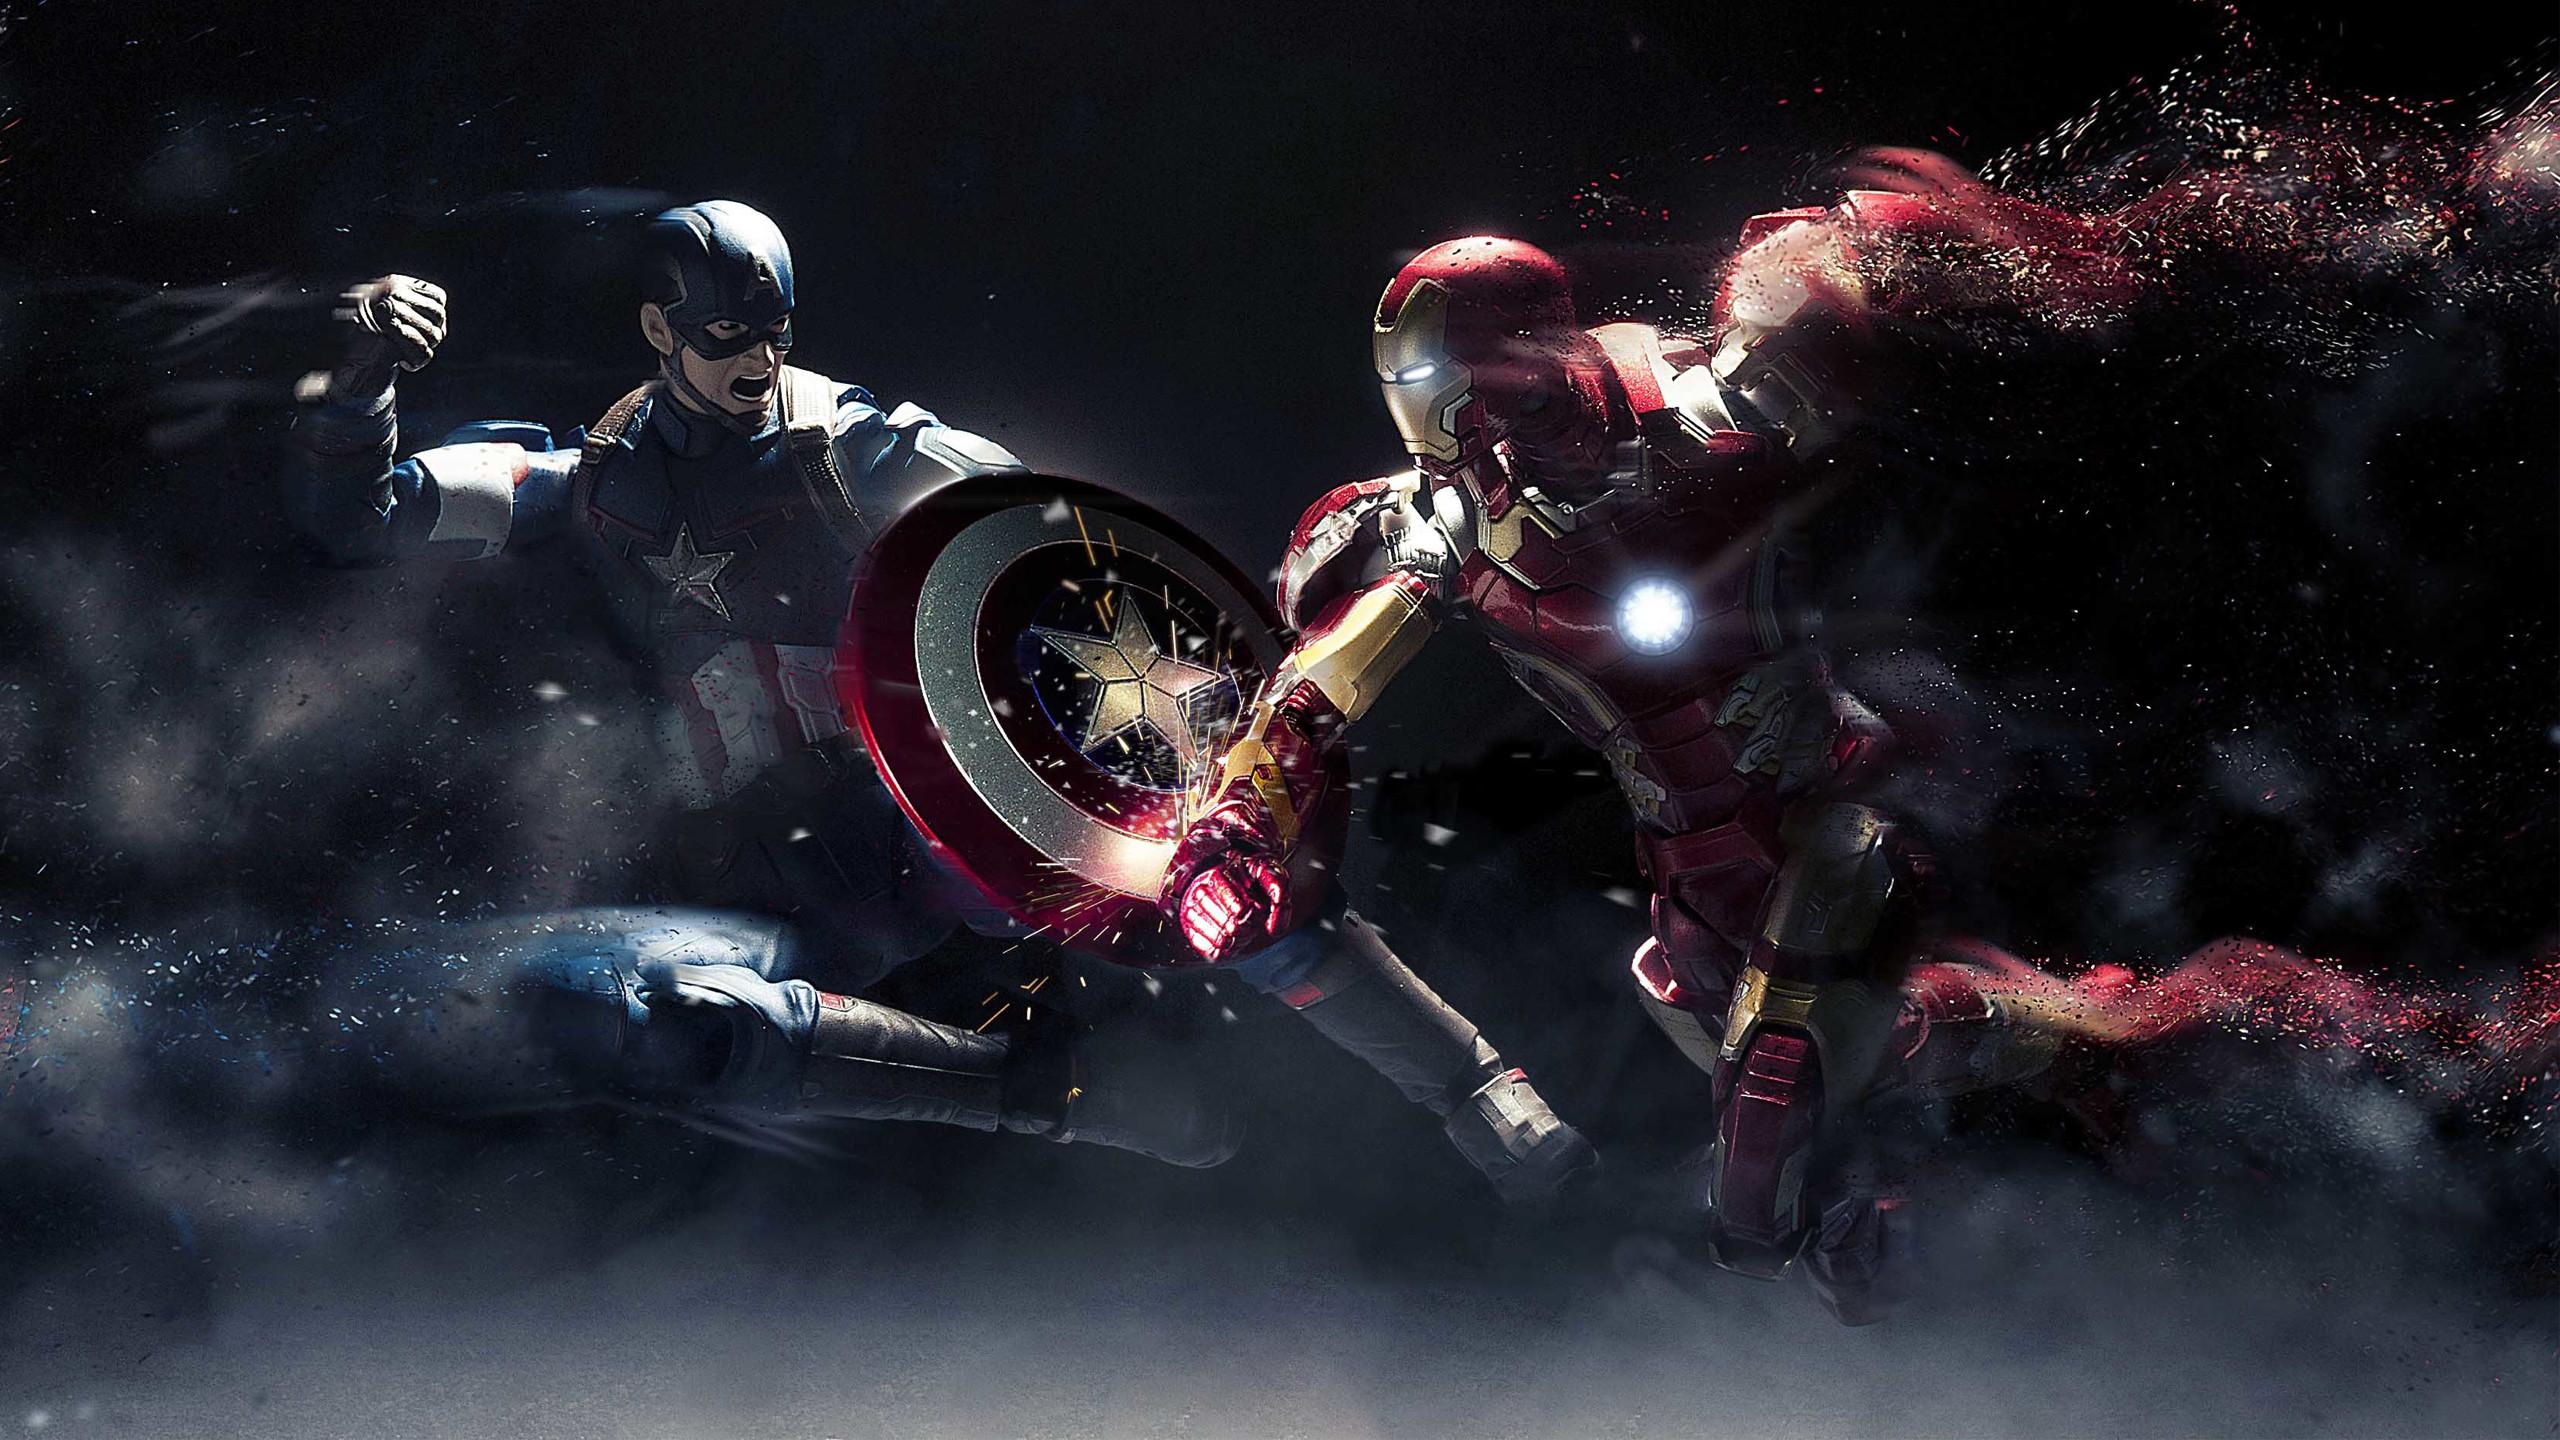 Captain America Civil War 2016 Wallpapers Ultra HD for desktop background.